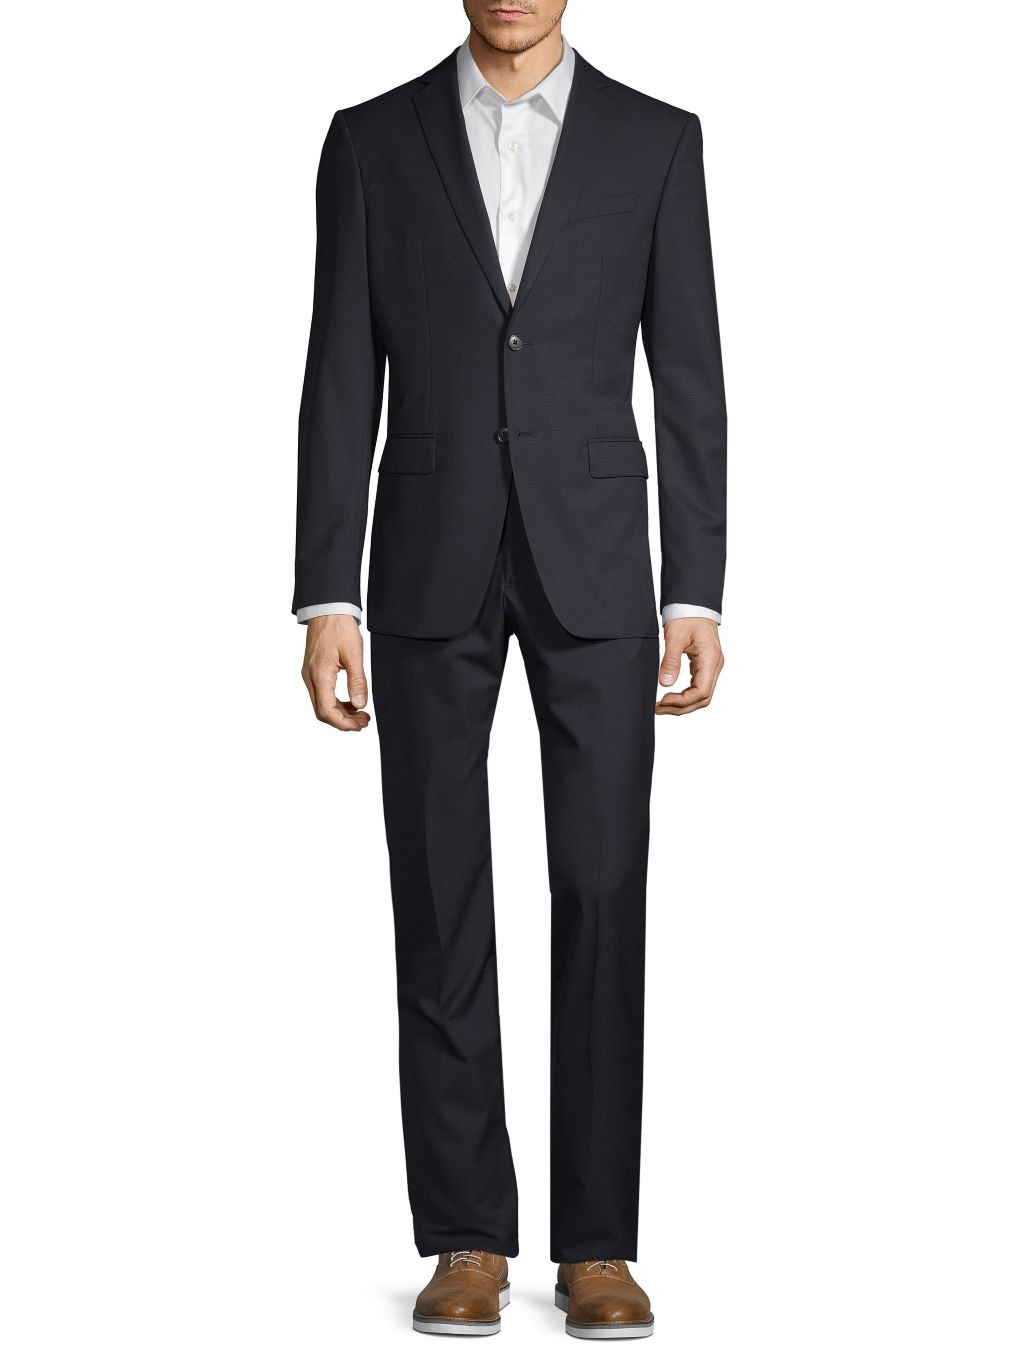 John Varvatos Star U.S.A. Classic Modern-Fit Wool Blend Suit